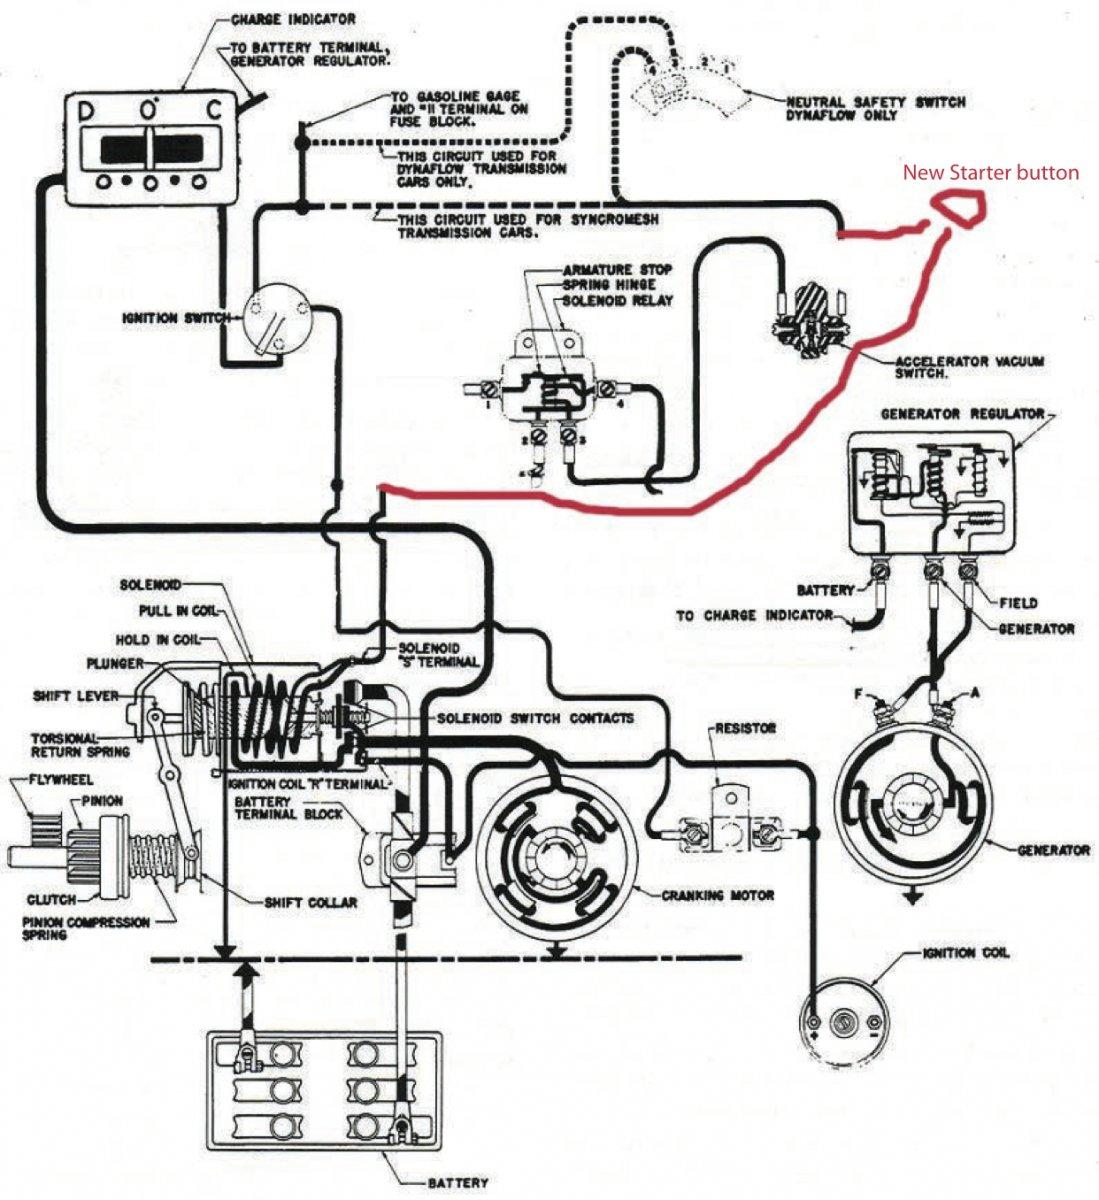 Buick Starter Generator Wiring Diagram Wire Center Hitachi Technical Help Needed 56 W 401 Nailhead The H A M B Rh Jalopyjournal Com Golf Cart